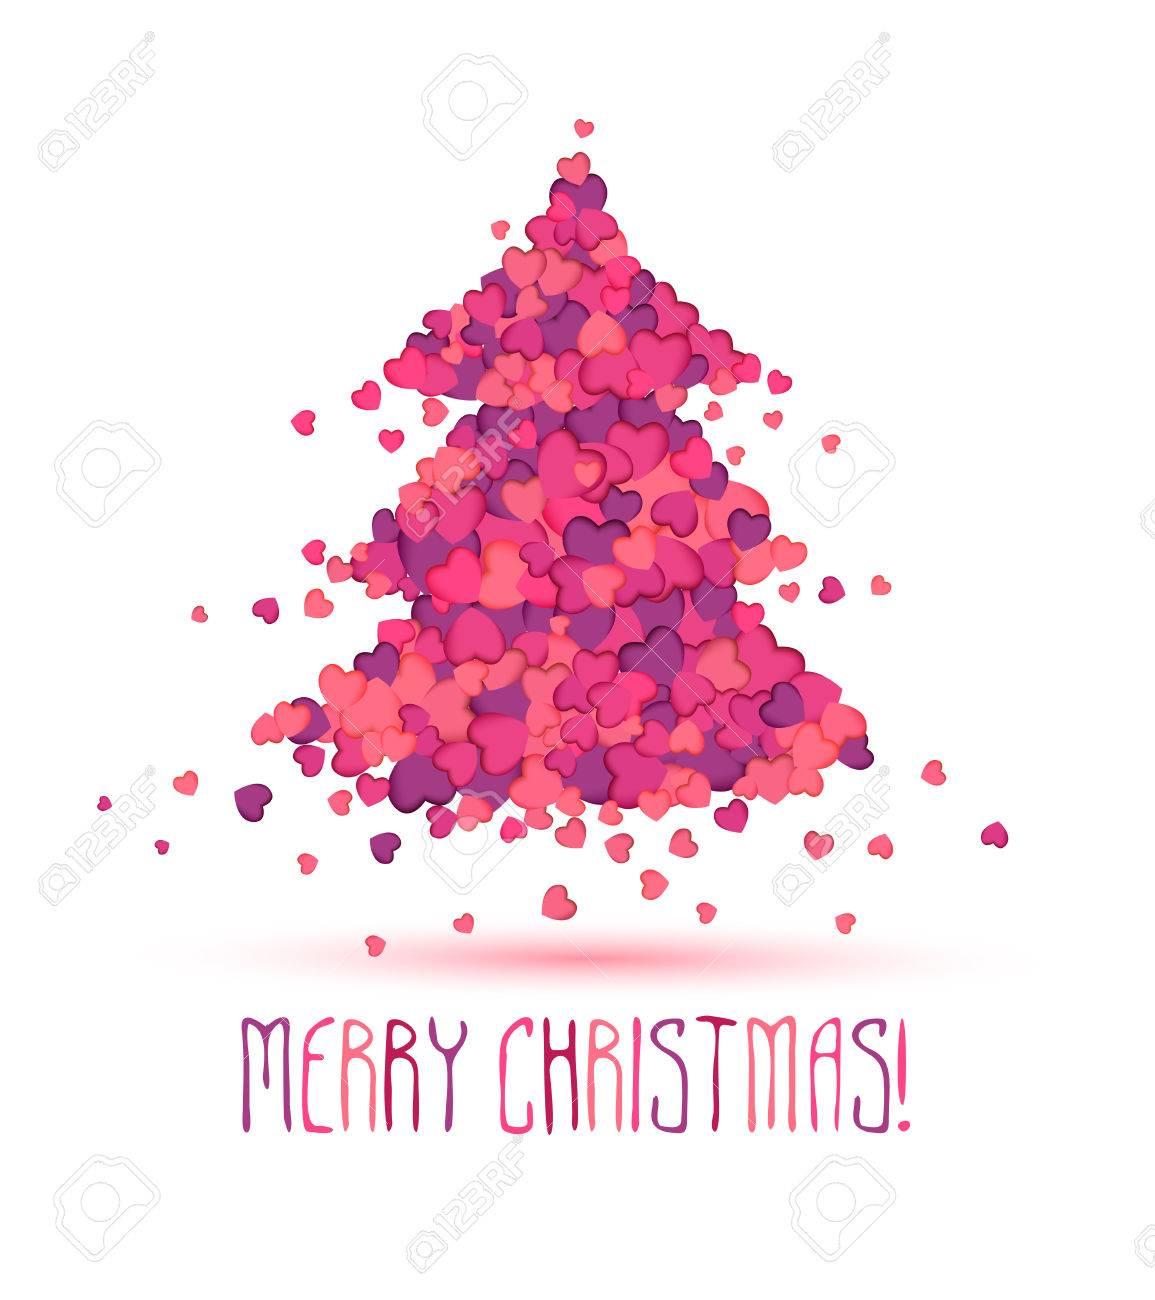 Christmas Beauty Salon.Beauty Salon Holiday Congratulation Card Christmas Tree Of